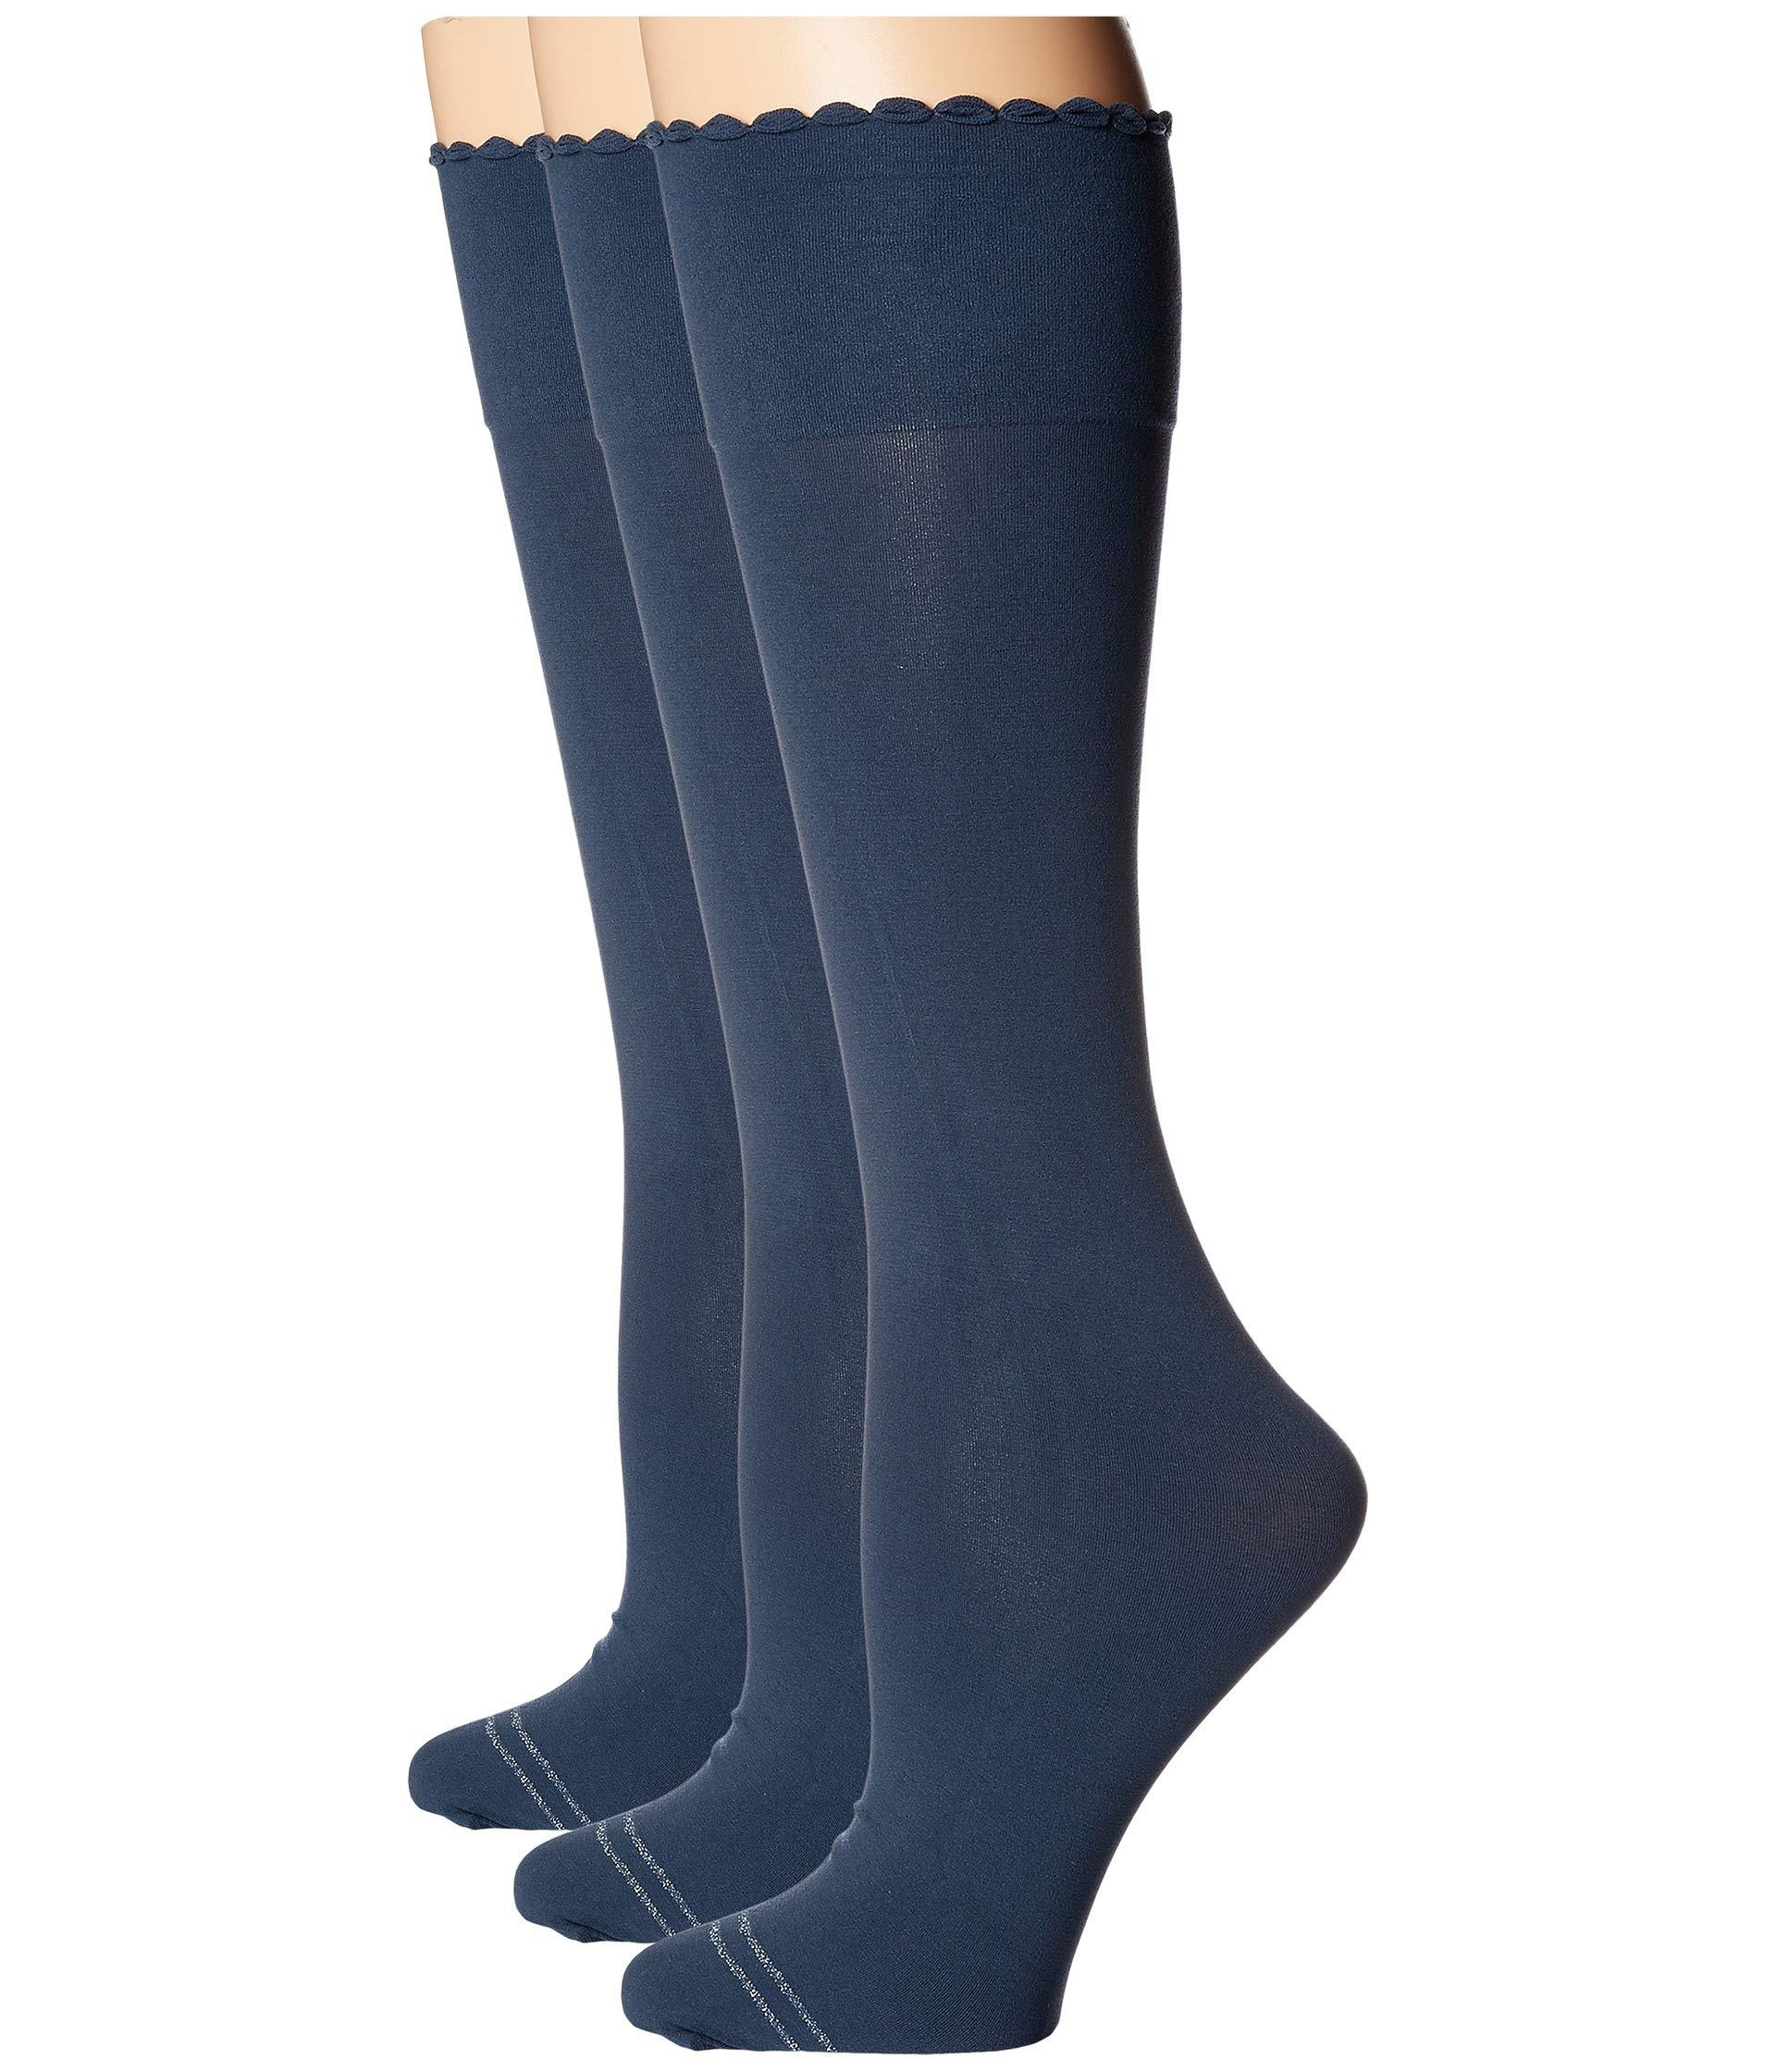 3 Blue Pack Socks pair Slate Knee Compression Opaque Hue High Graduated wSUqUvY